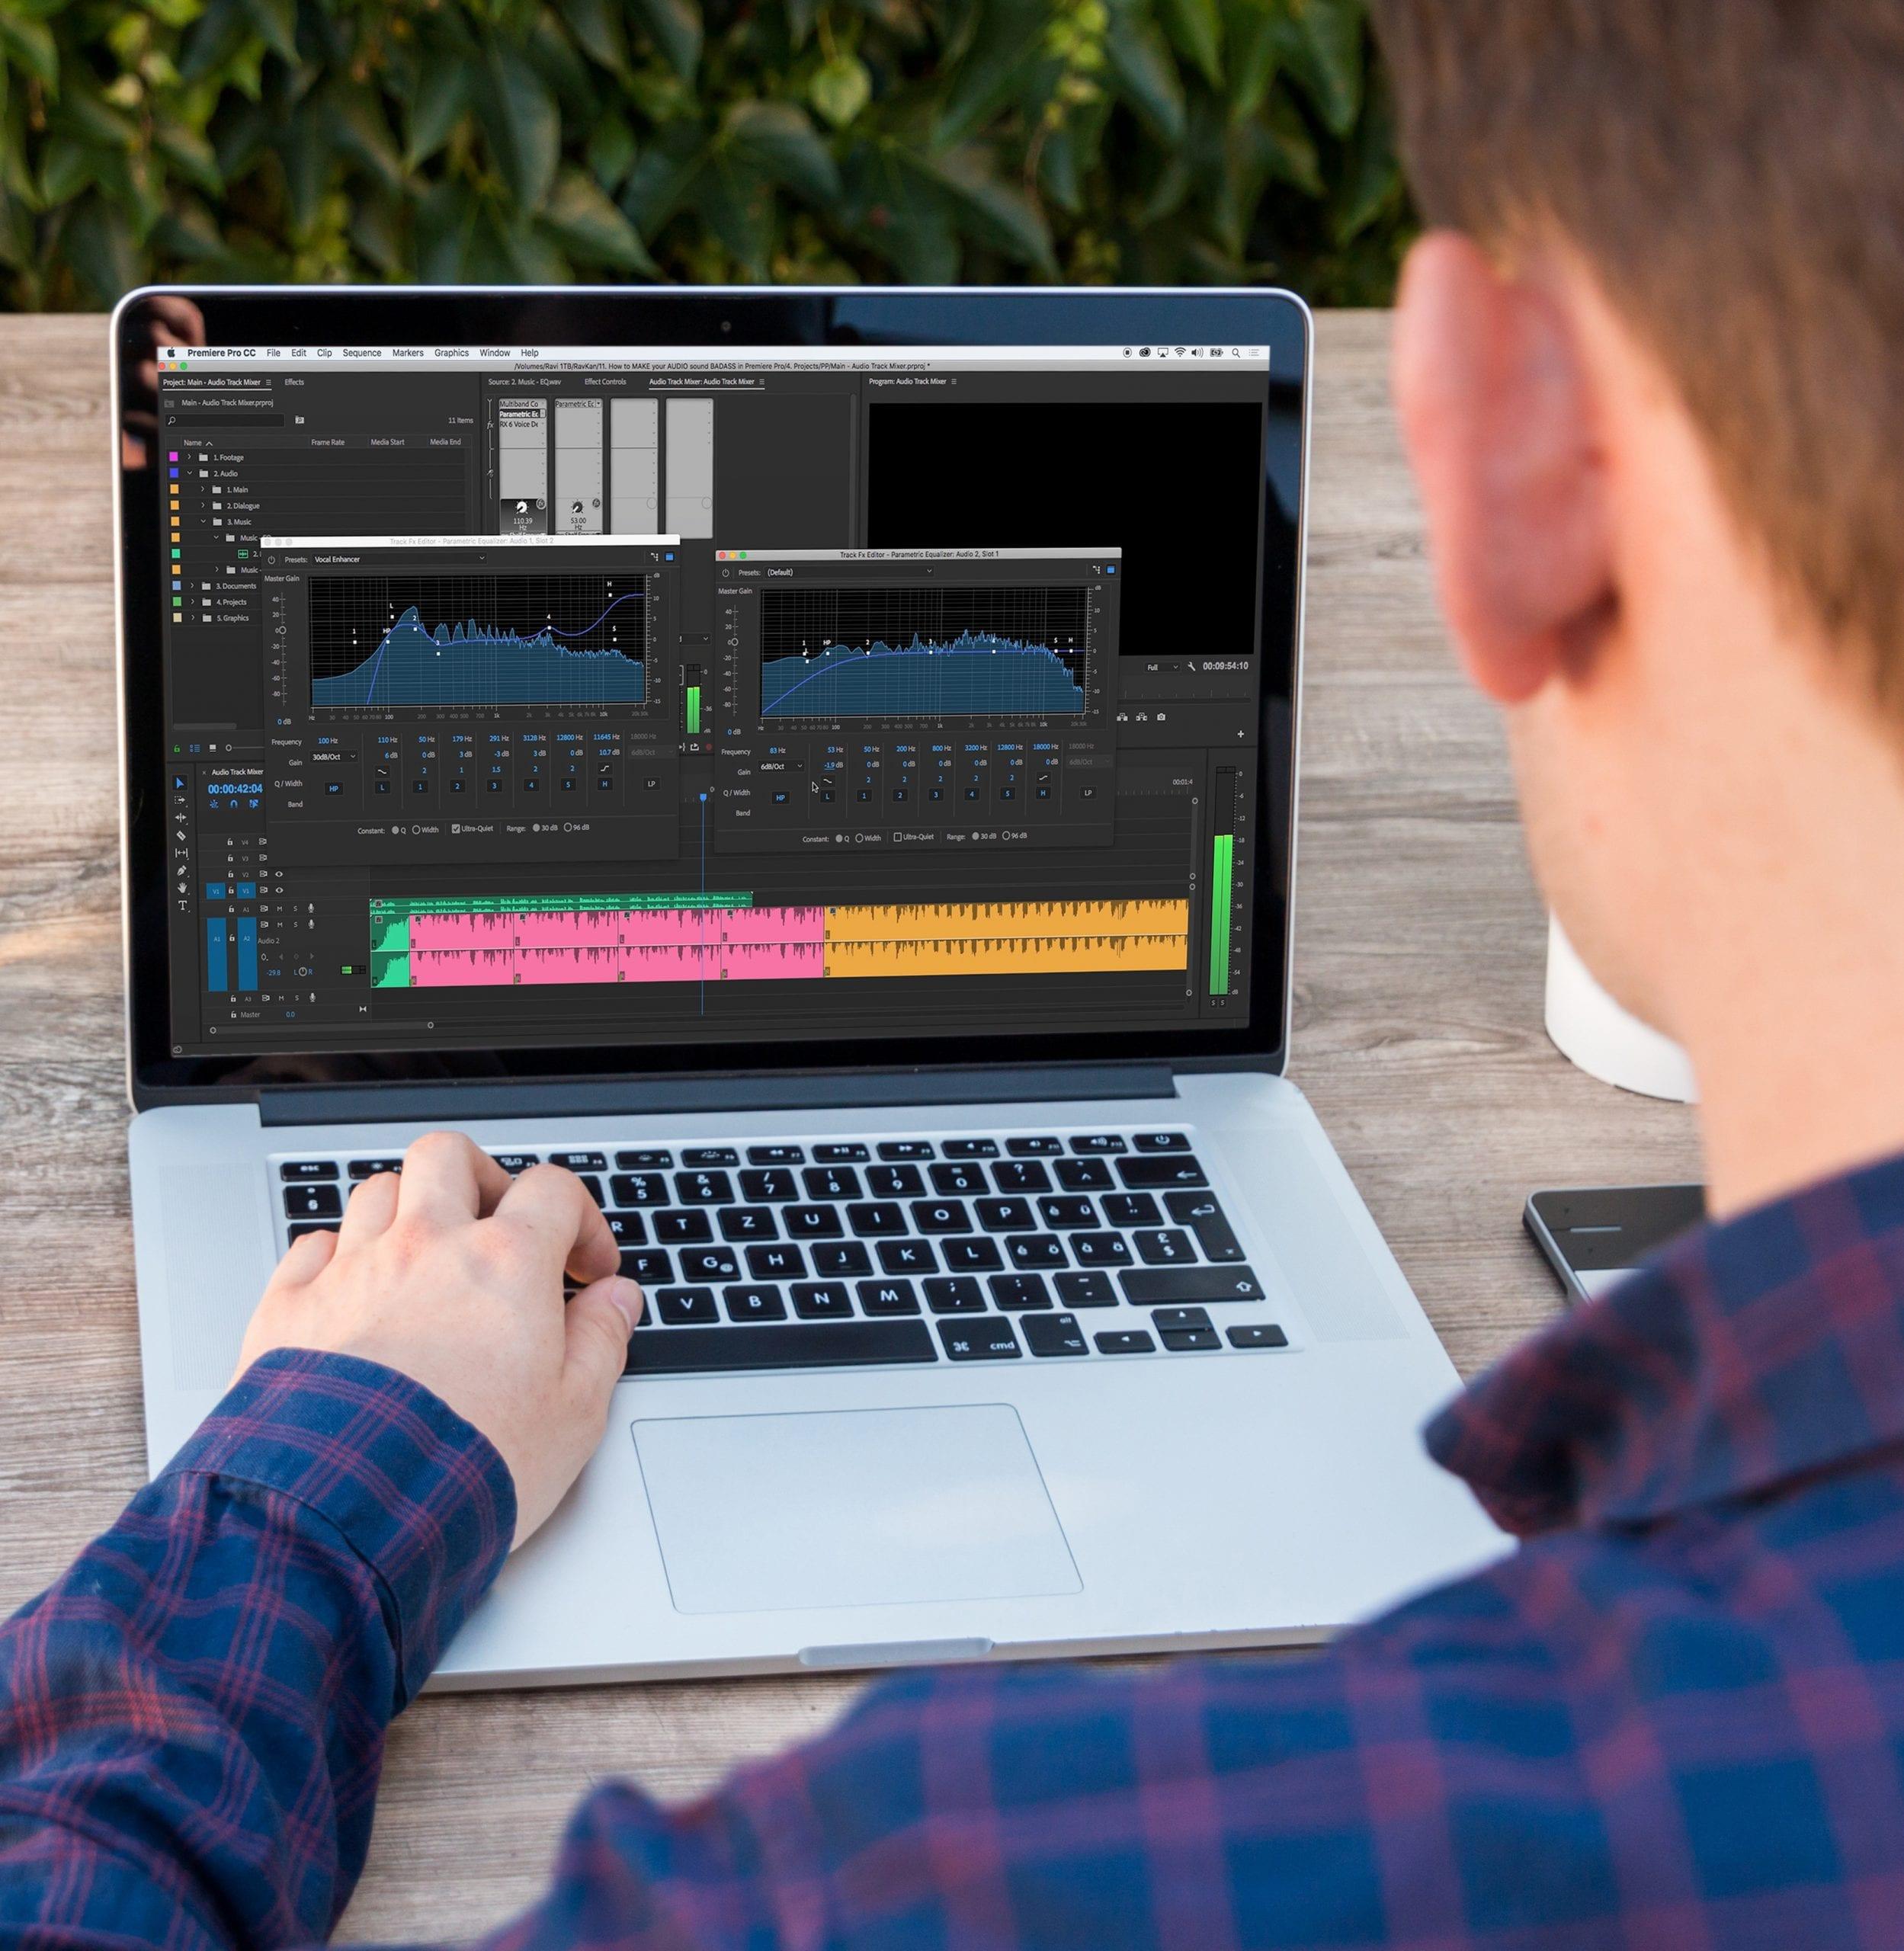 man-on-laptop-premiere-pro-audio